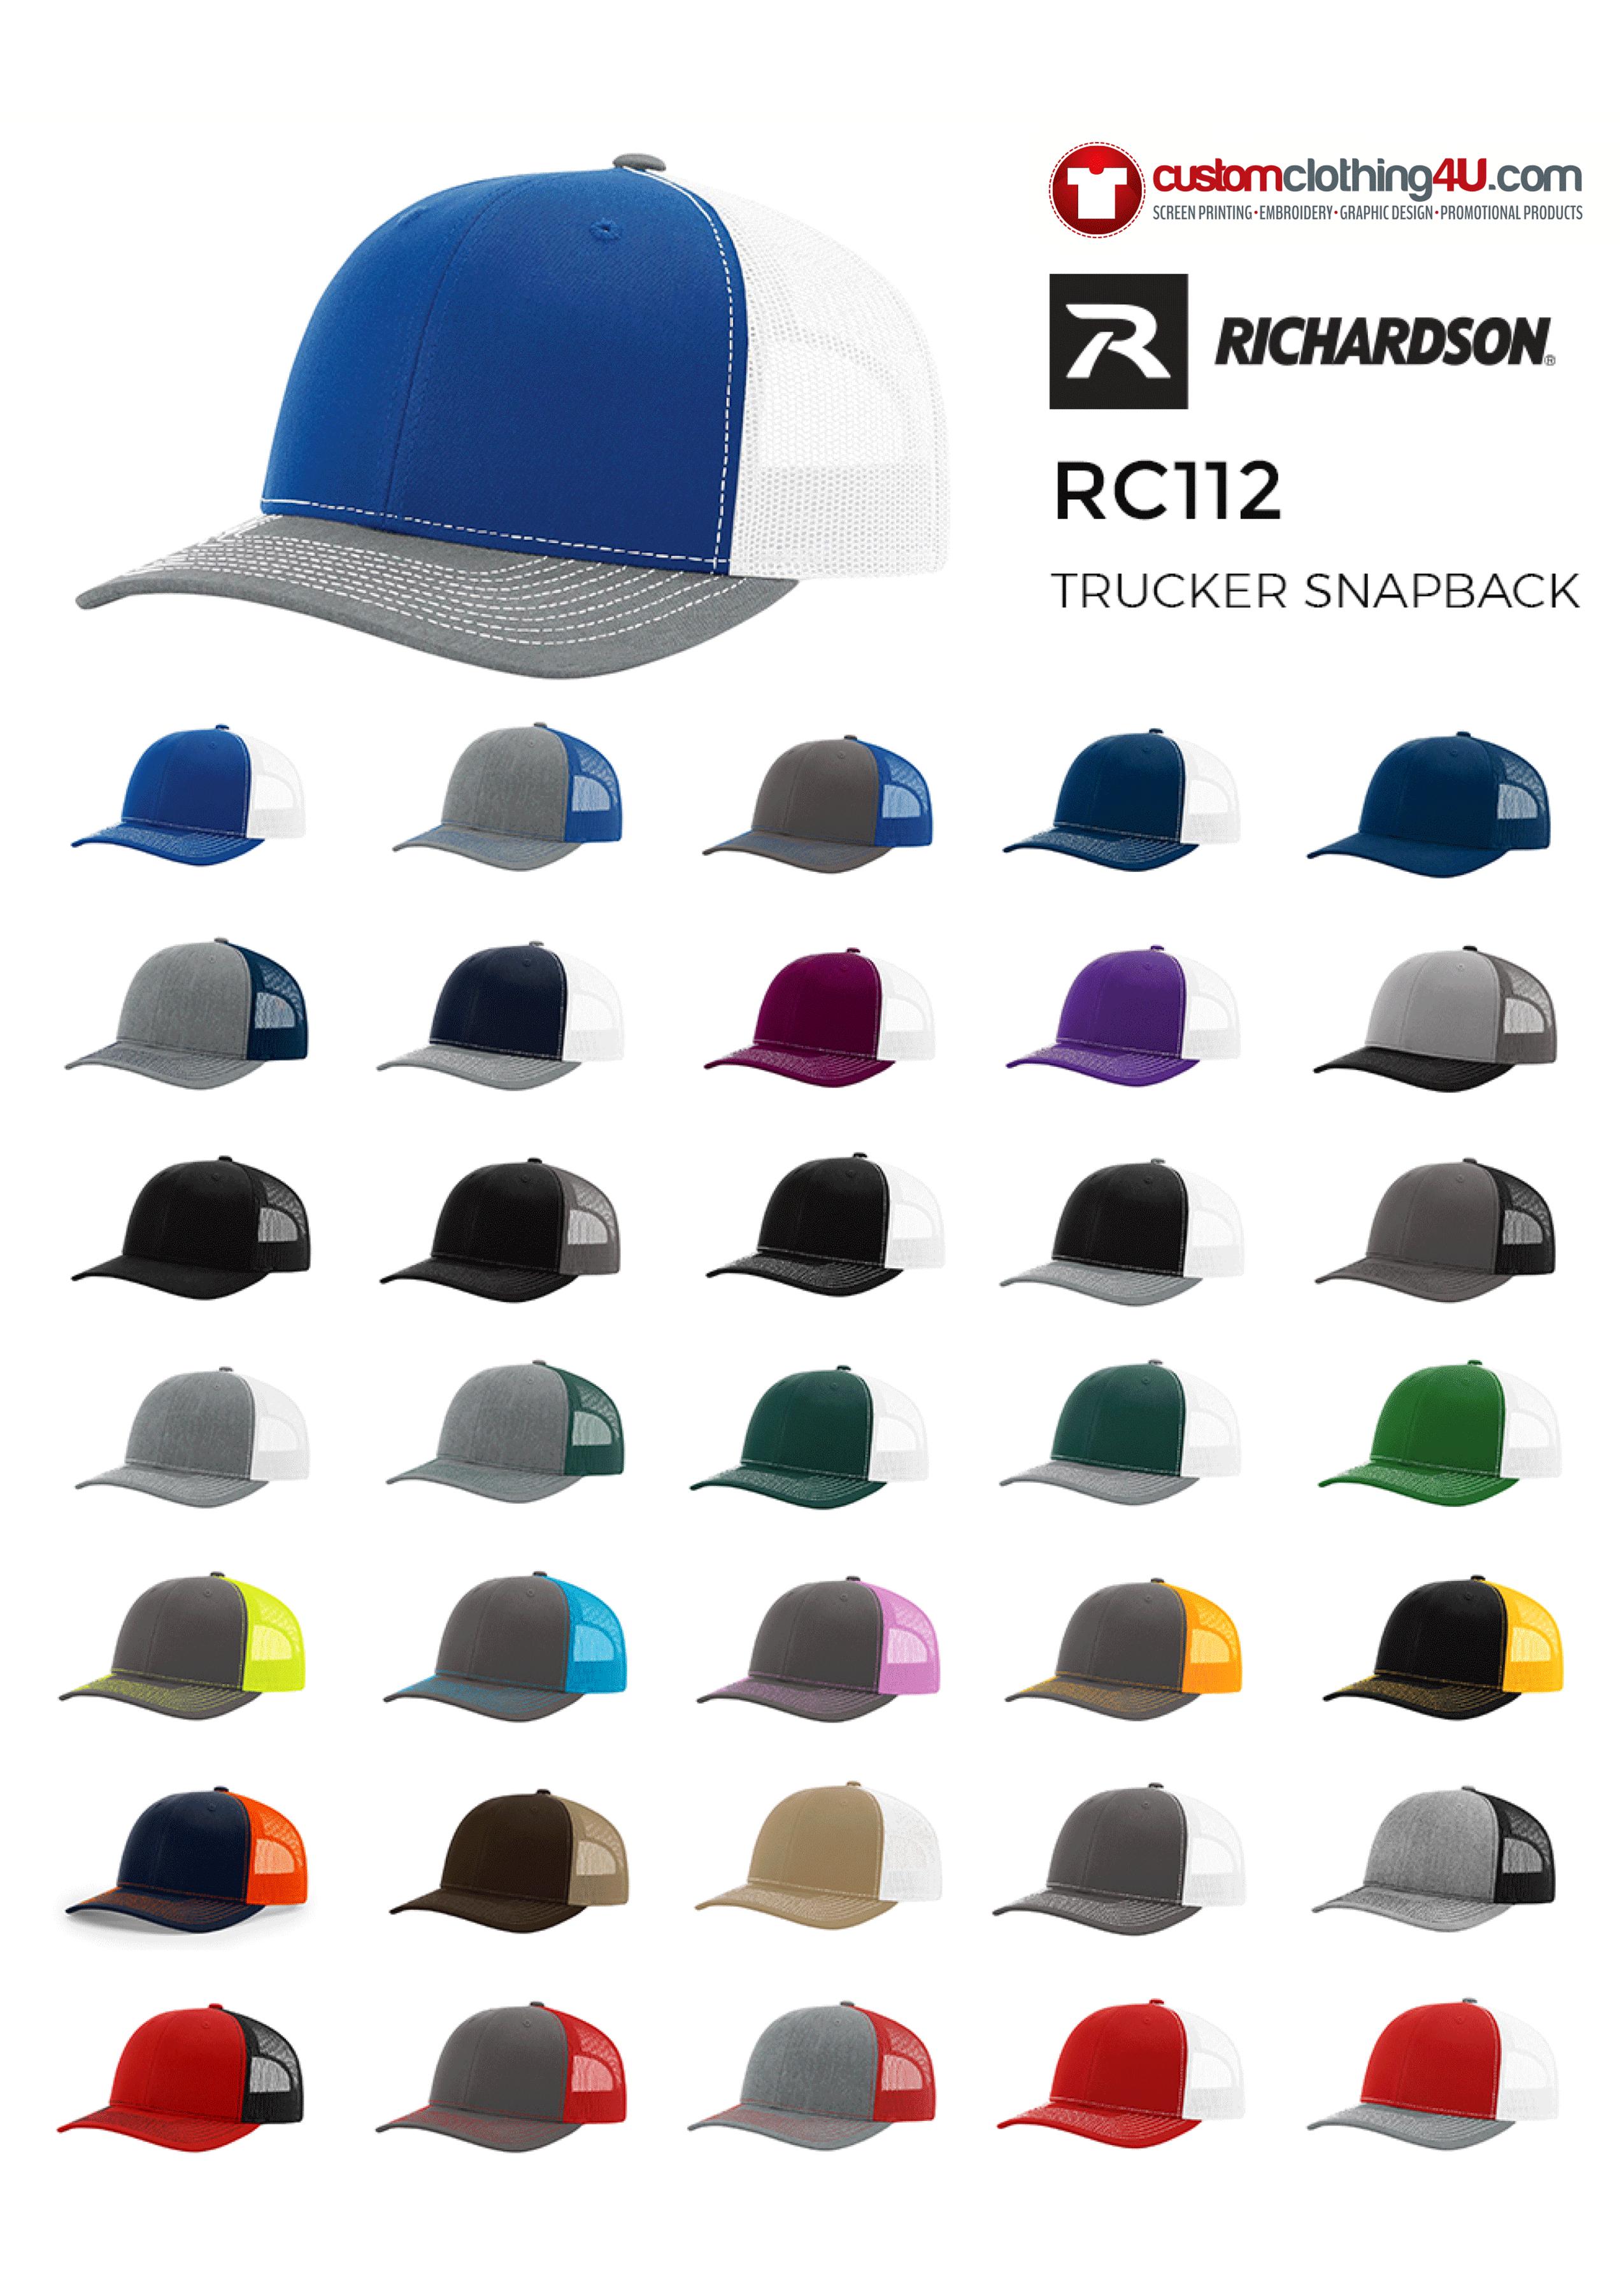 CC4U - Richardson hats - branded baseball caps - your logo on a hat